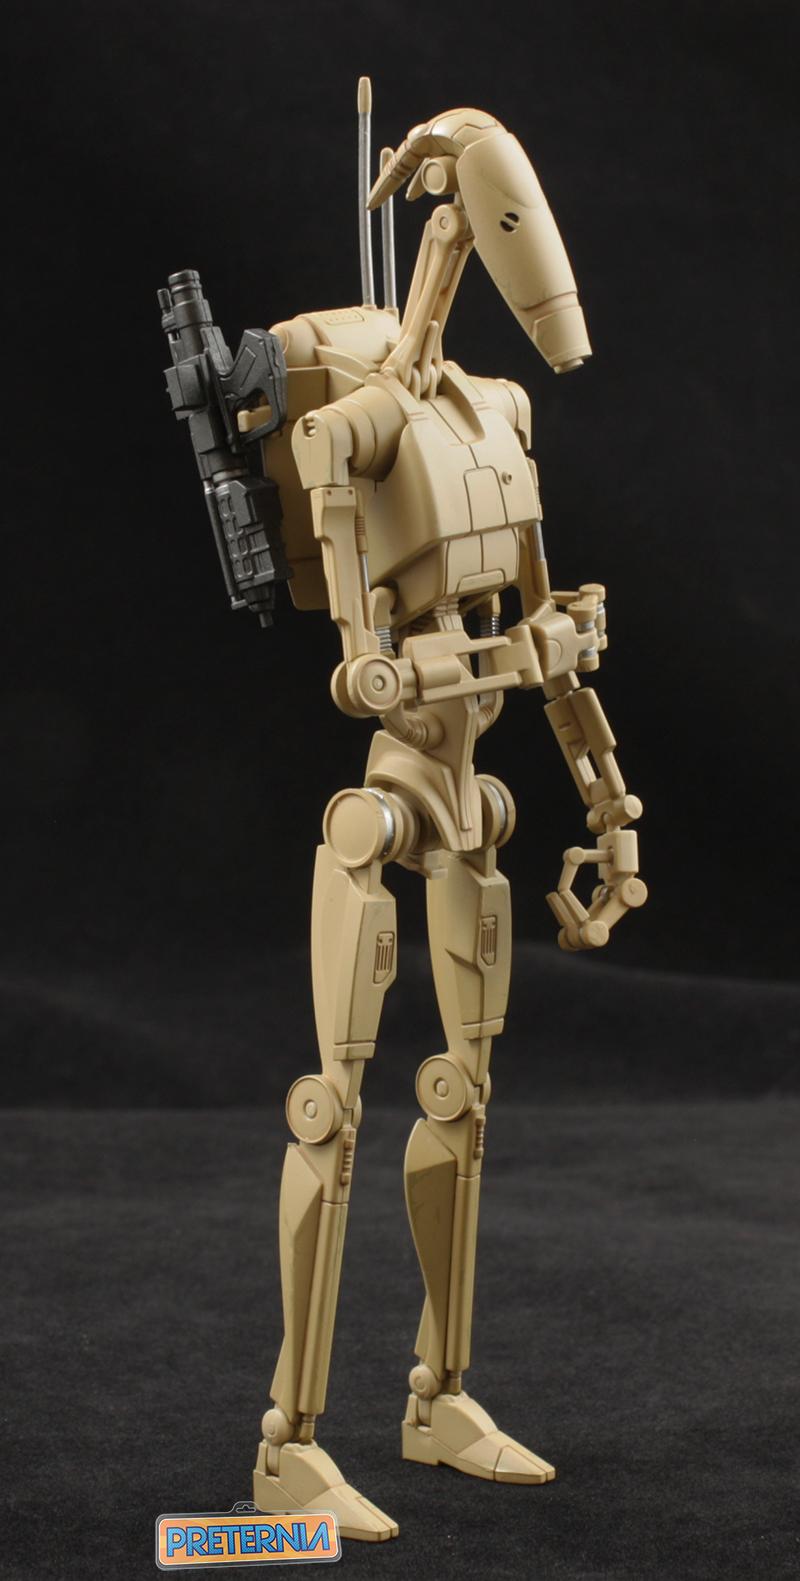 S h figuarts star wars battle droid episode 1 preternia - Robot blanc star wars ...